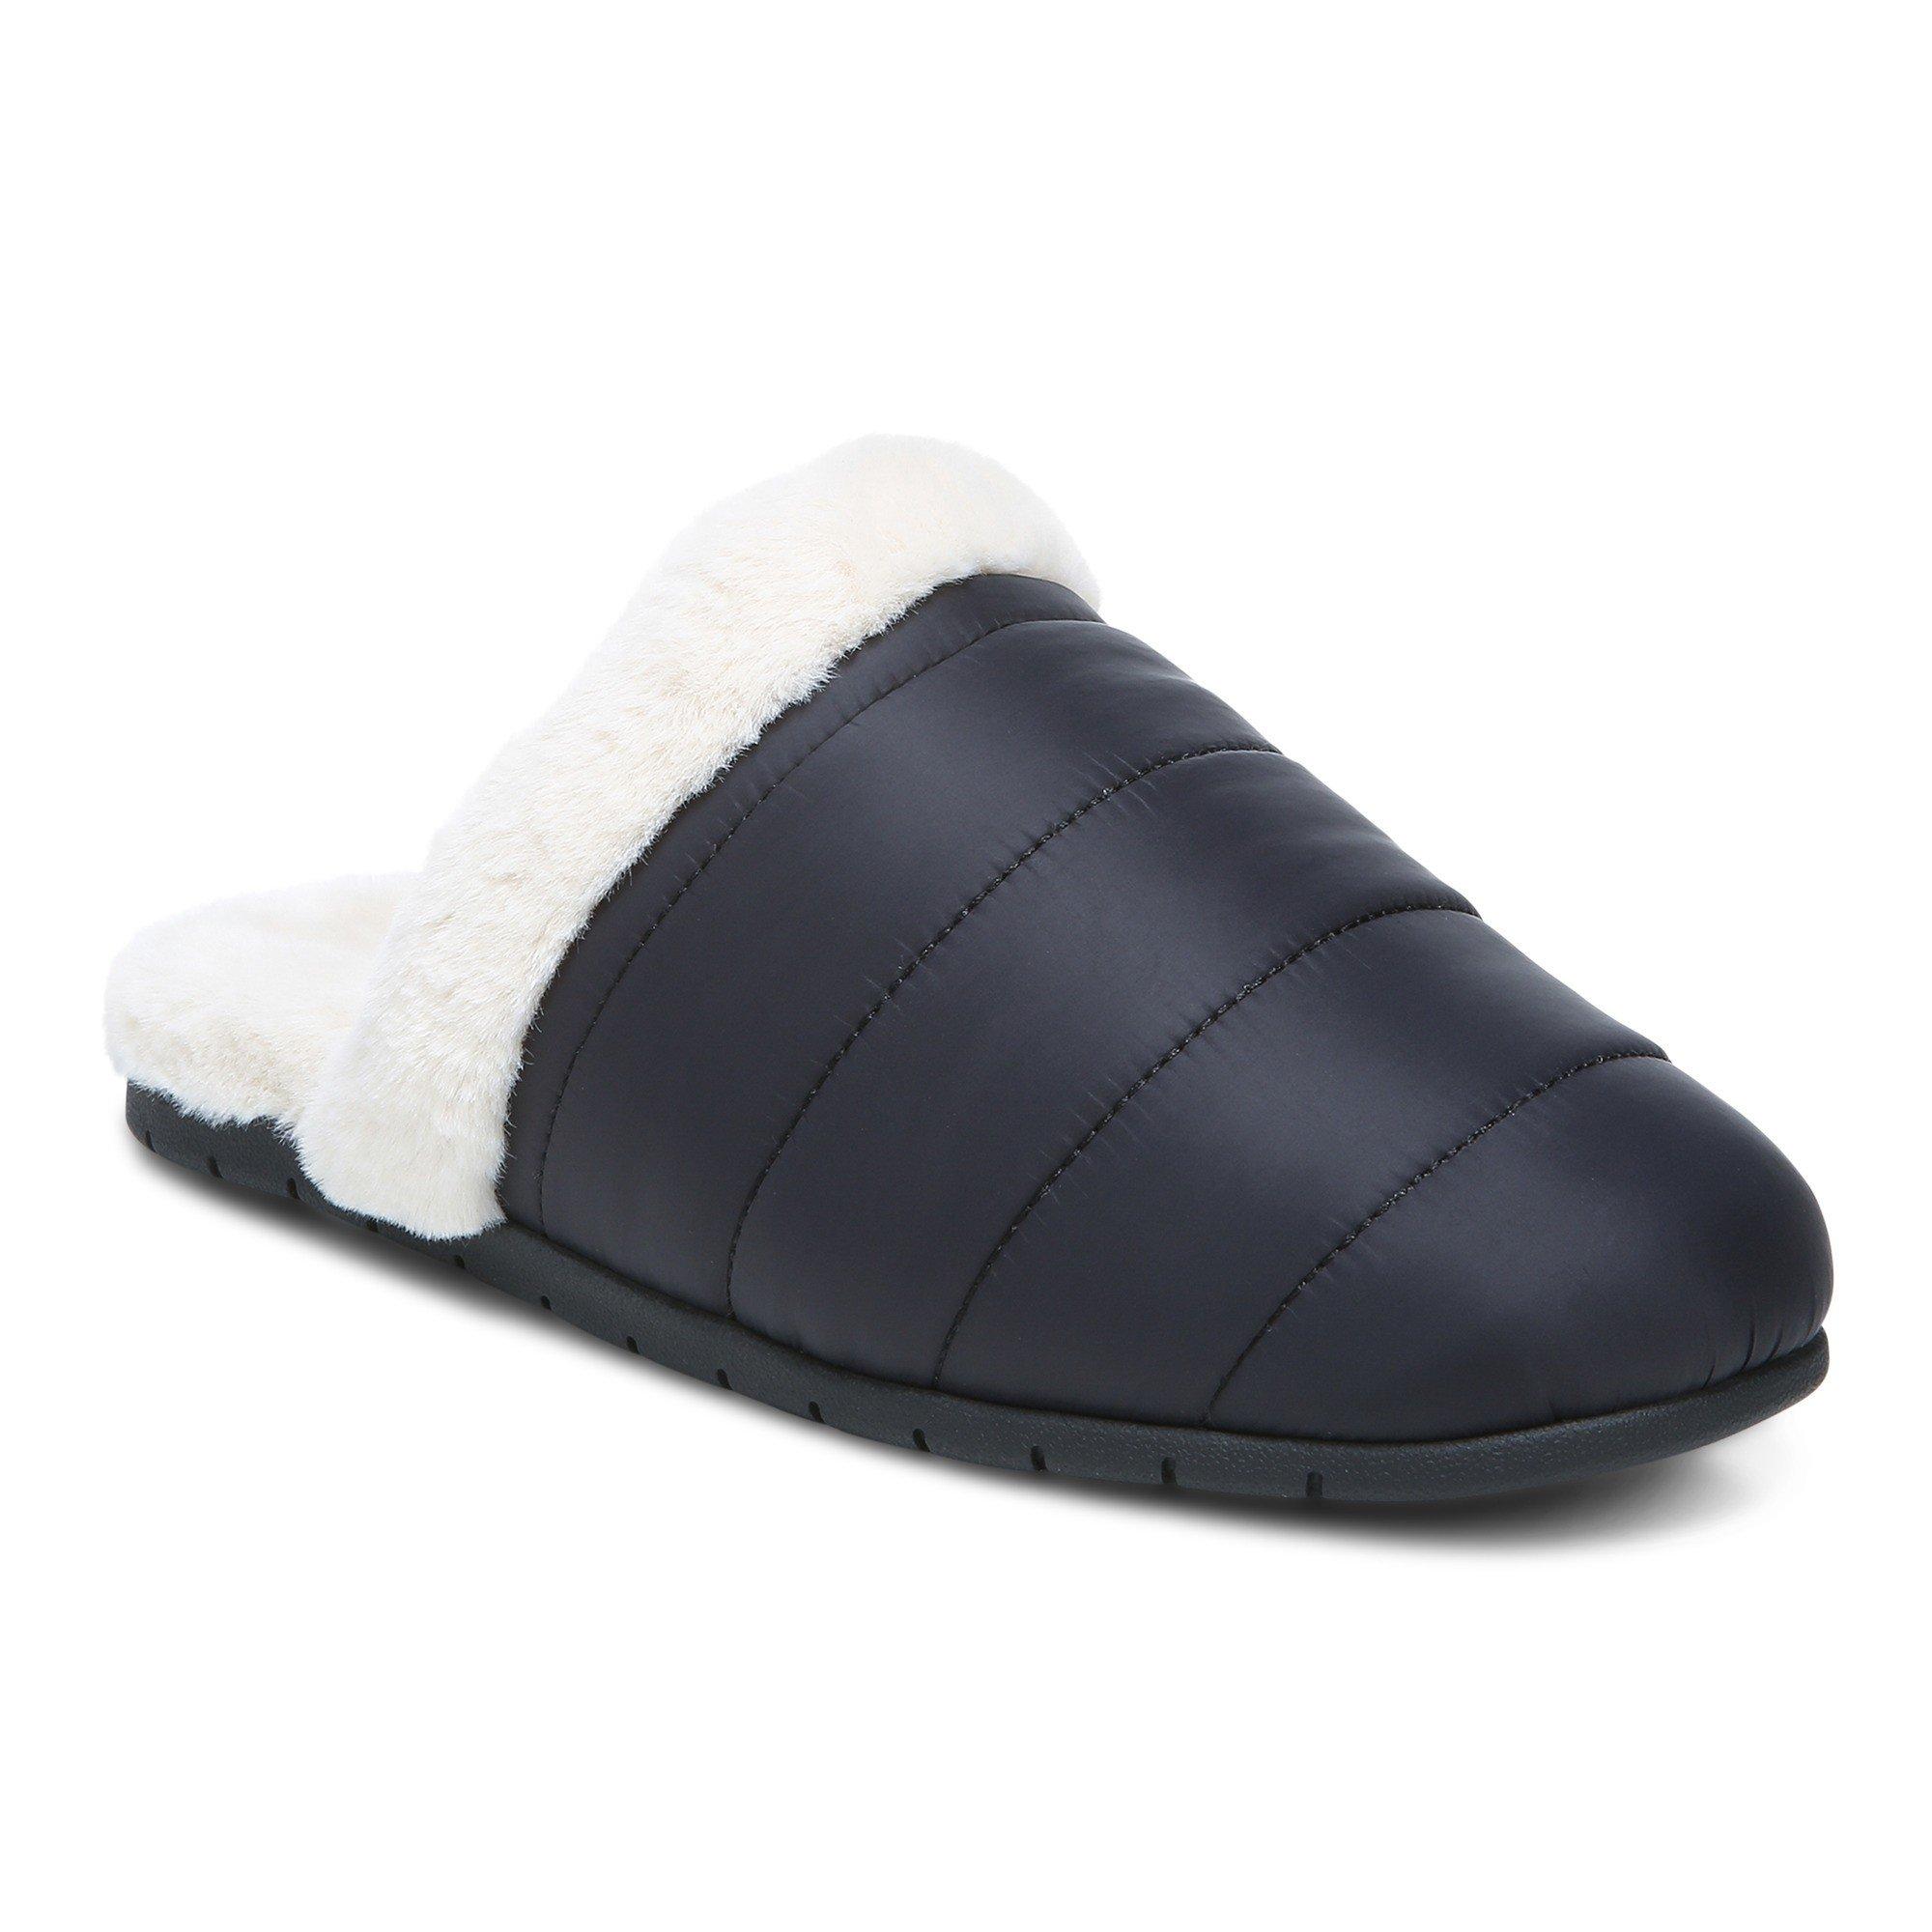 Vionic josephine slippers